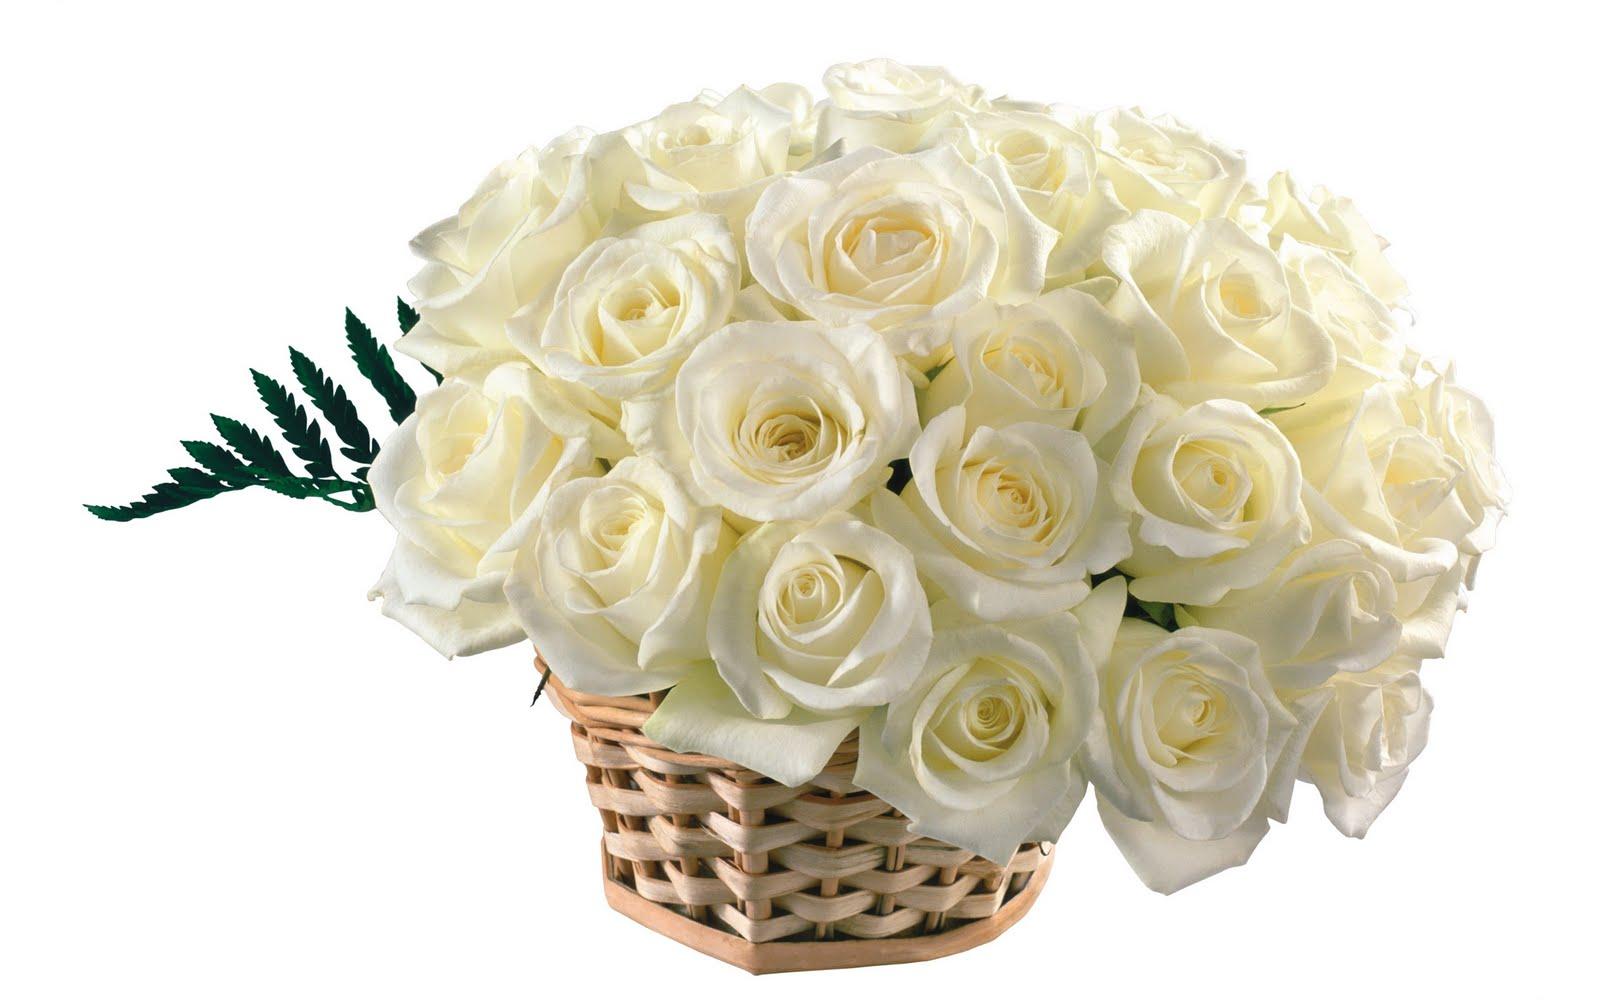 http://3.bp.blogspot.com/_Zw41kxI2akg/TBj5ZurSUHI/AAAAAAAACaE/GFJyZHduJec/s1600/trandafiri_albi.JPG